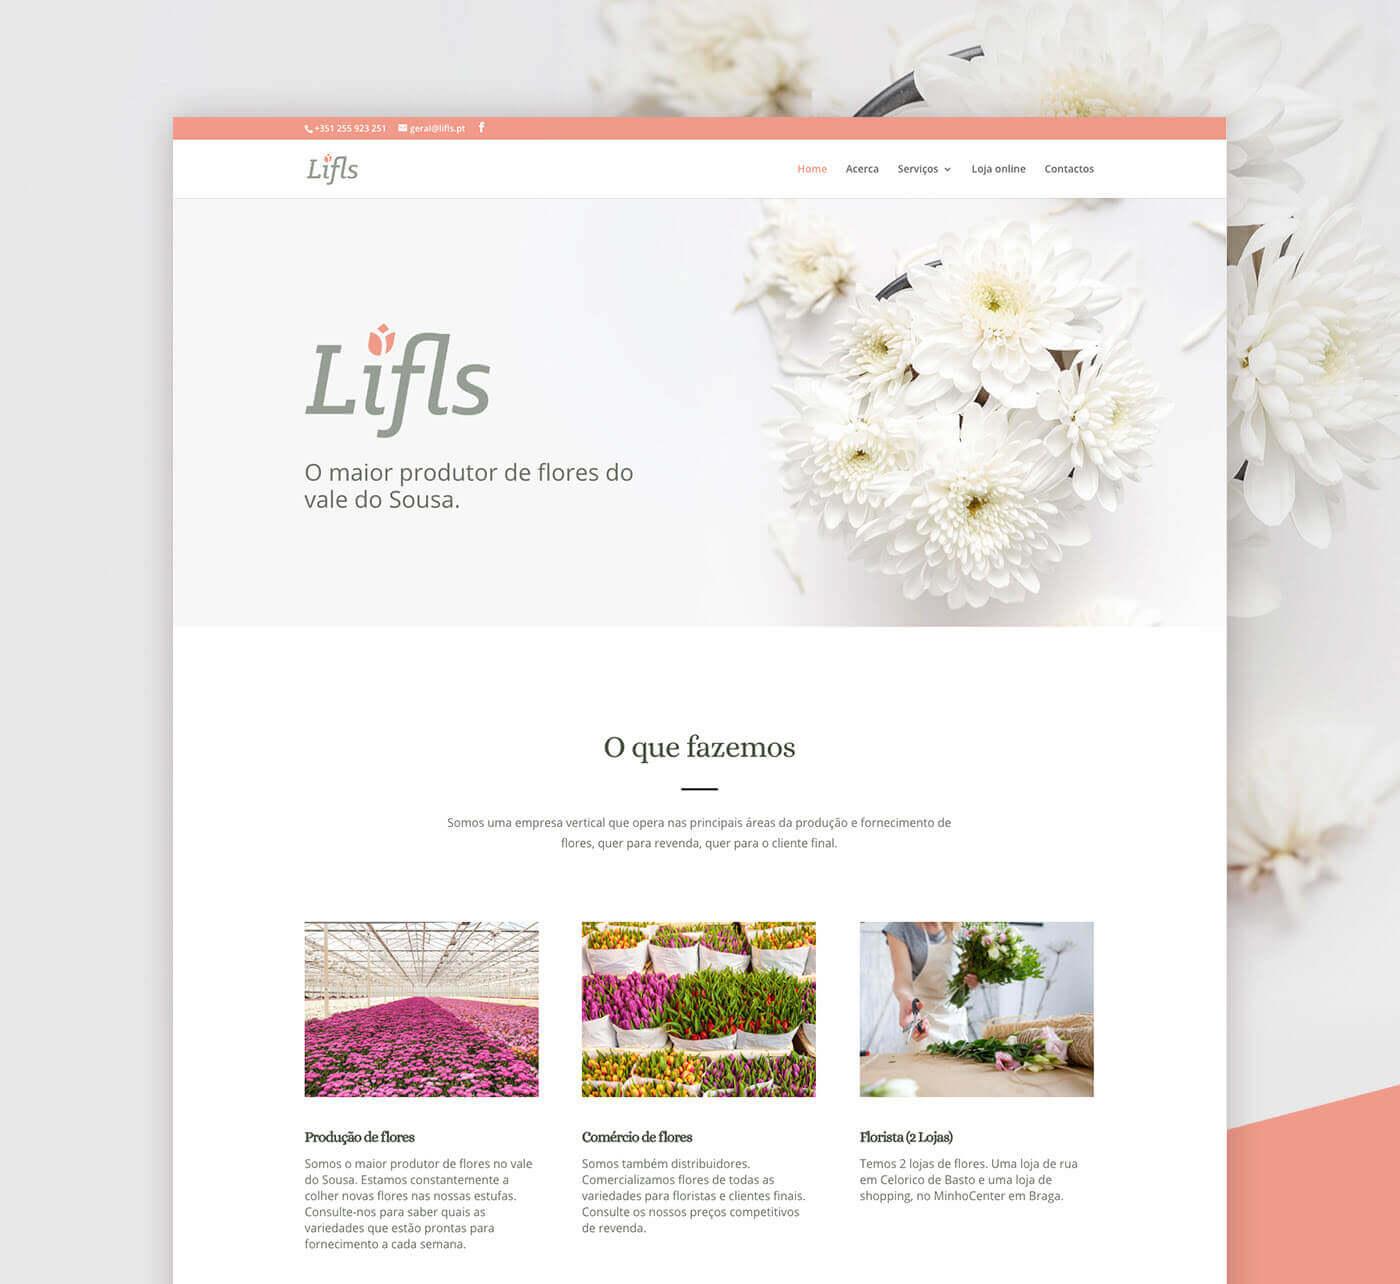 Flowers, production, website, web design, lifls